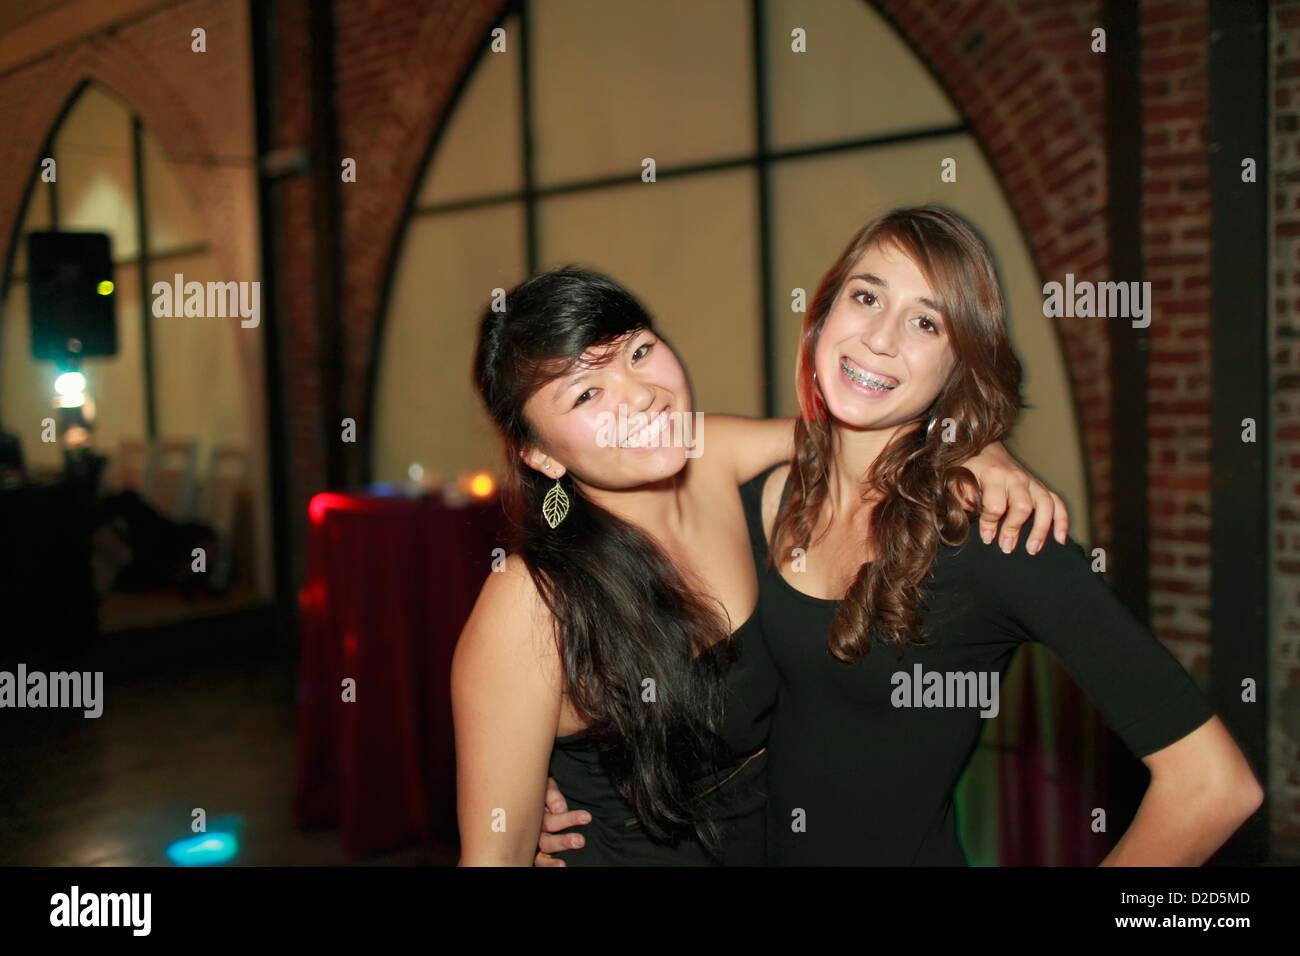 Teenage girls at birthday party - Stock Image